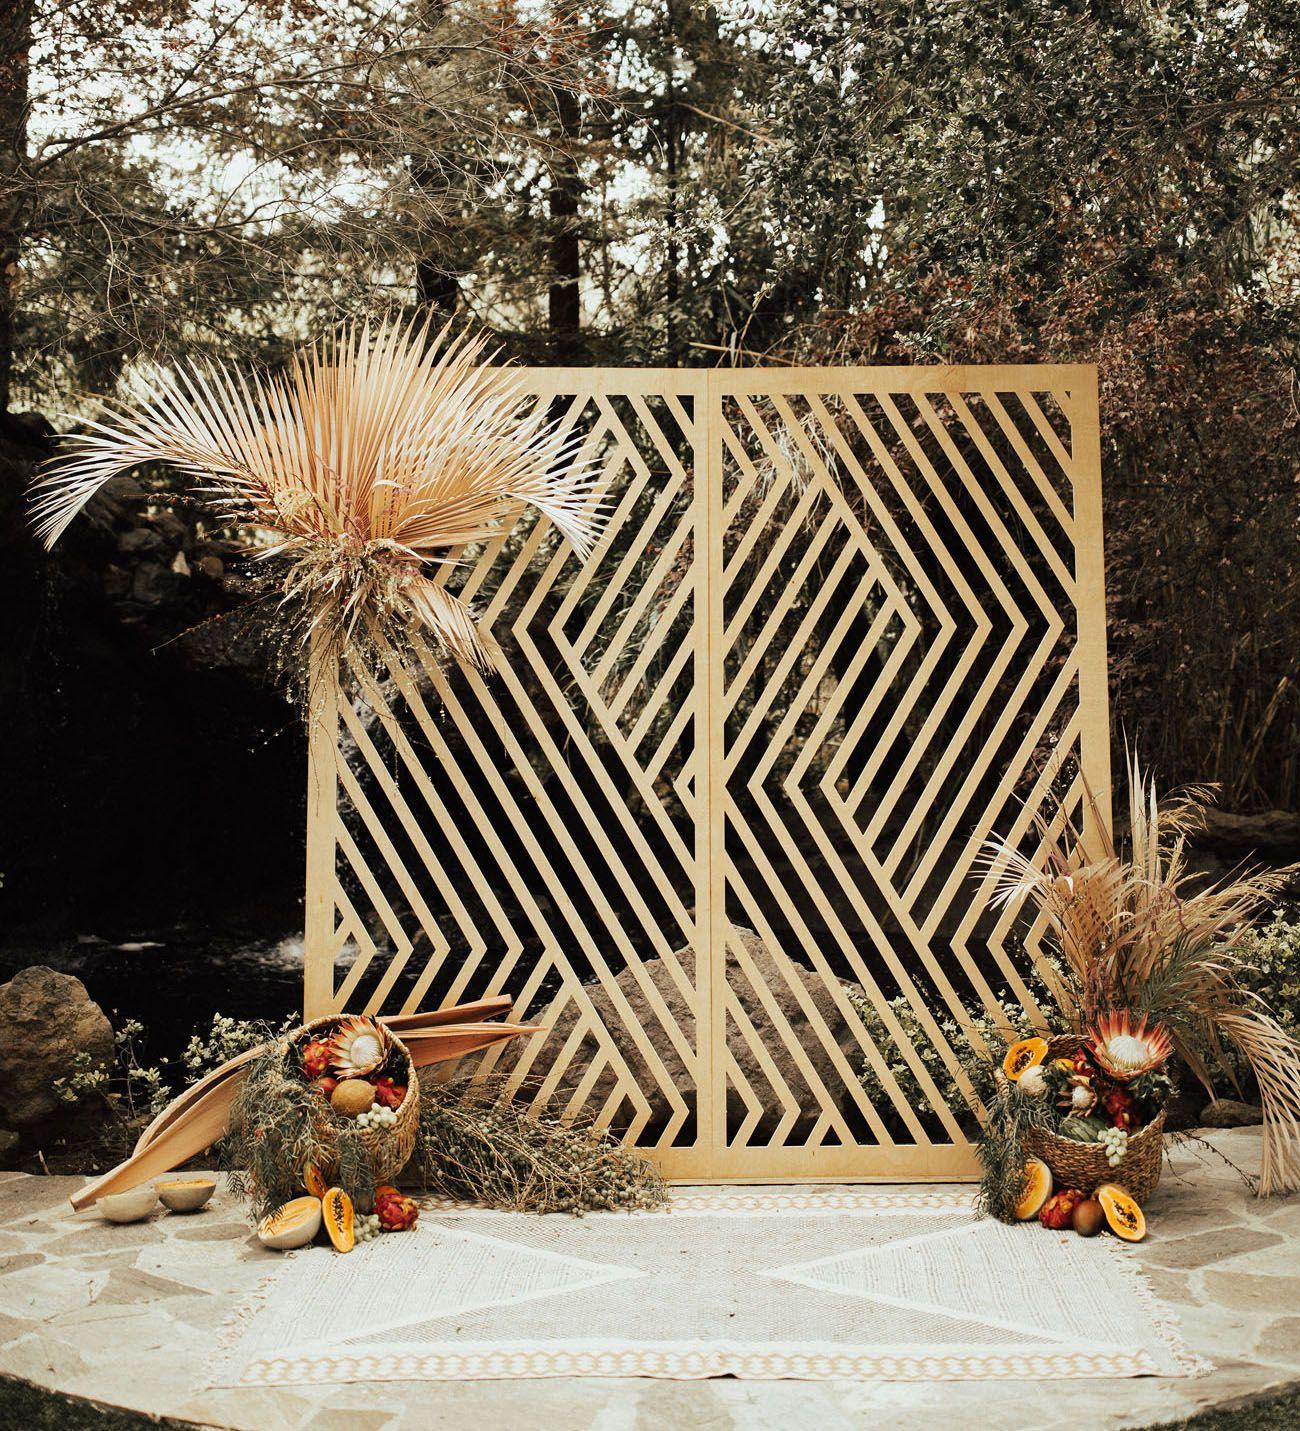 Wedding Altar Meet The Parents: Bohemian + Geometric Themes Meet In This Malibu Wedding